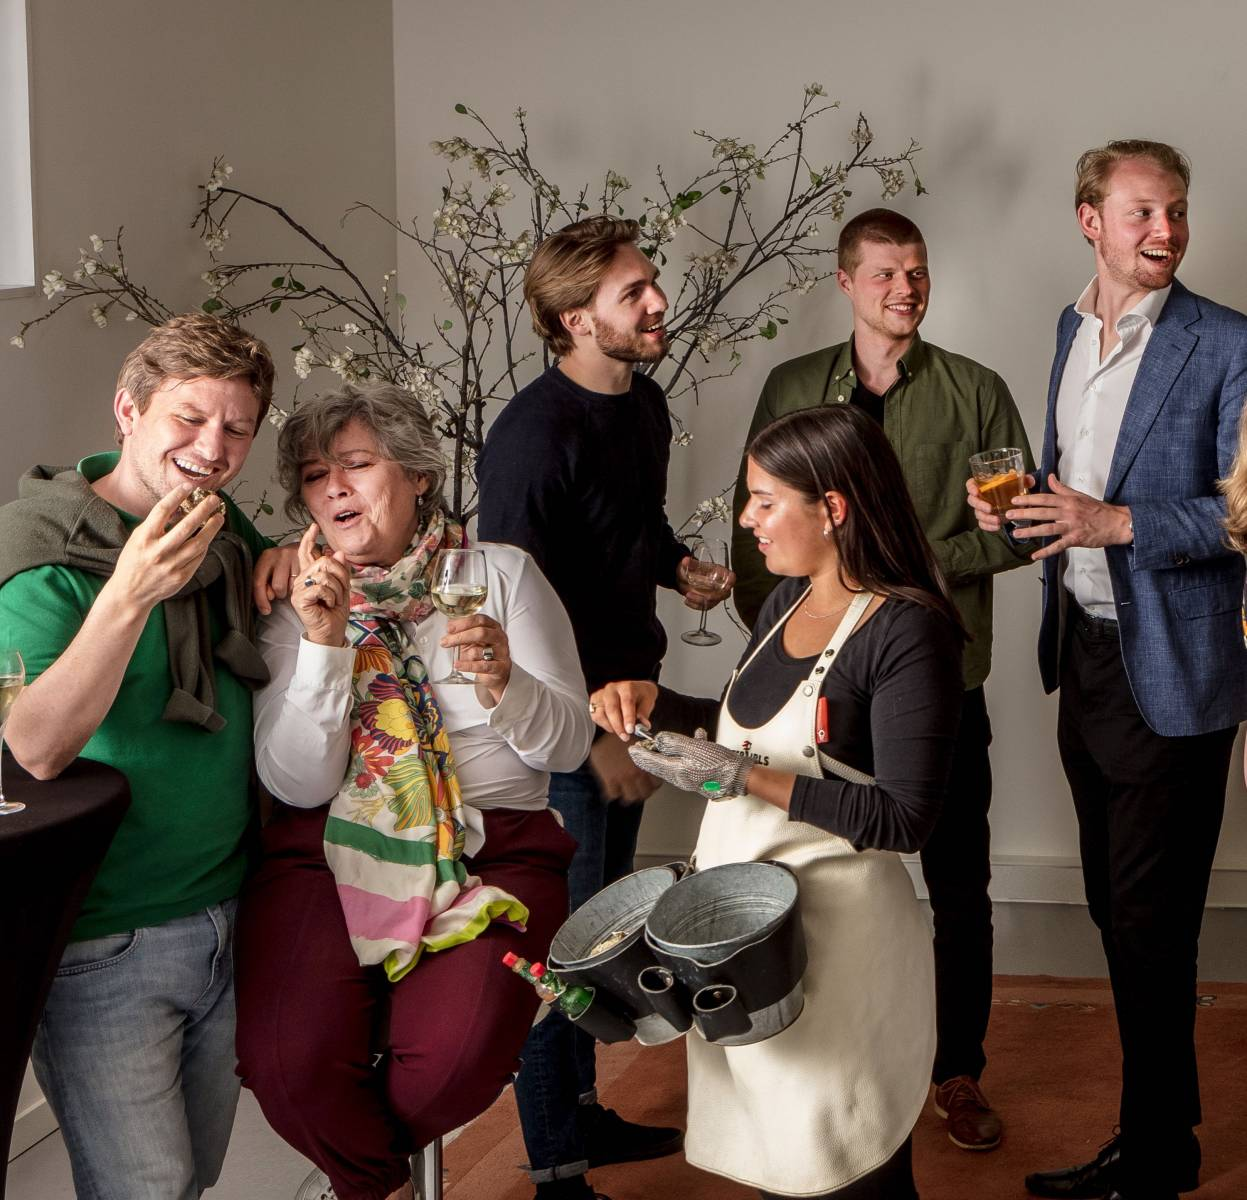 Oestercompagnie - Oesters op je trouw, huwelijk, bruiloft - Catering - Showcooking - House of Weddings - 9